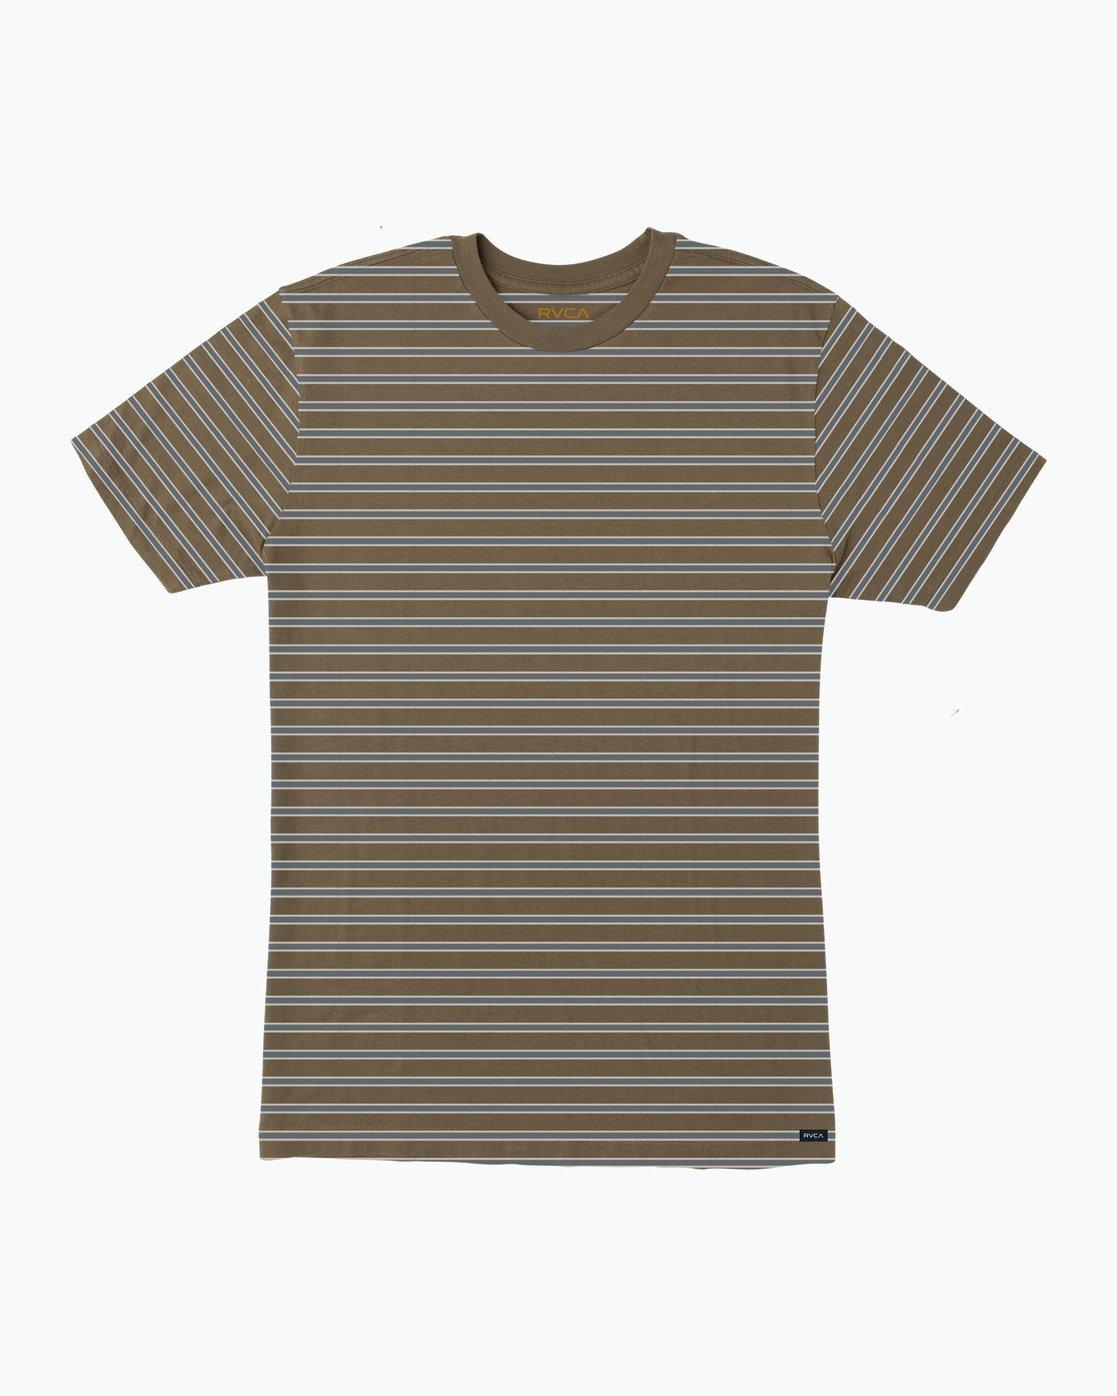 0 Brong Stripe T-Shirt Multicolor M430SRBR RVCA